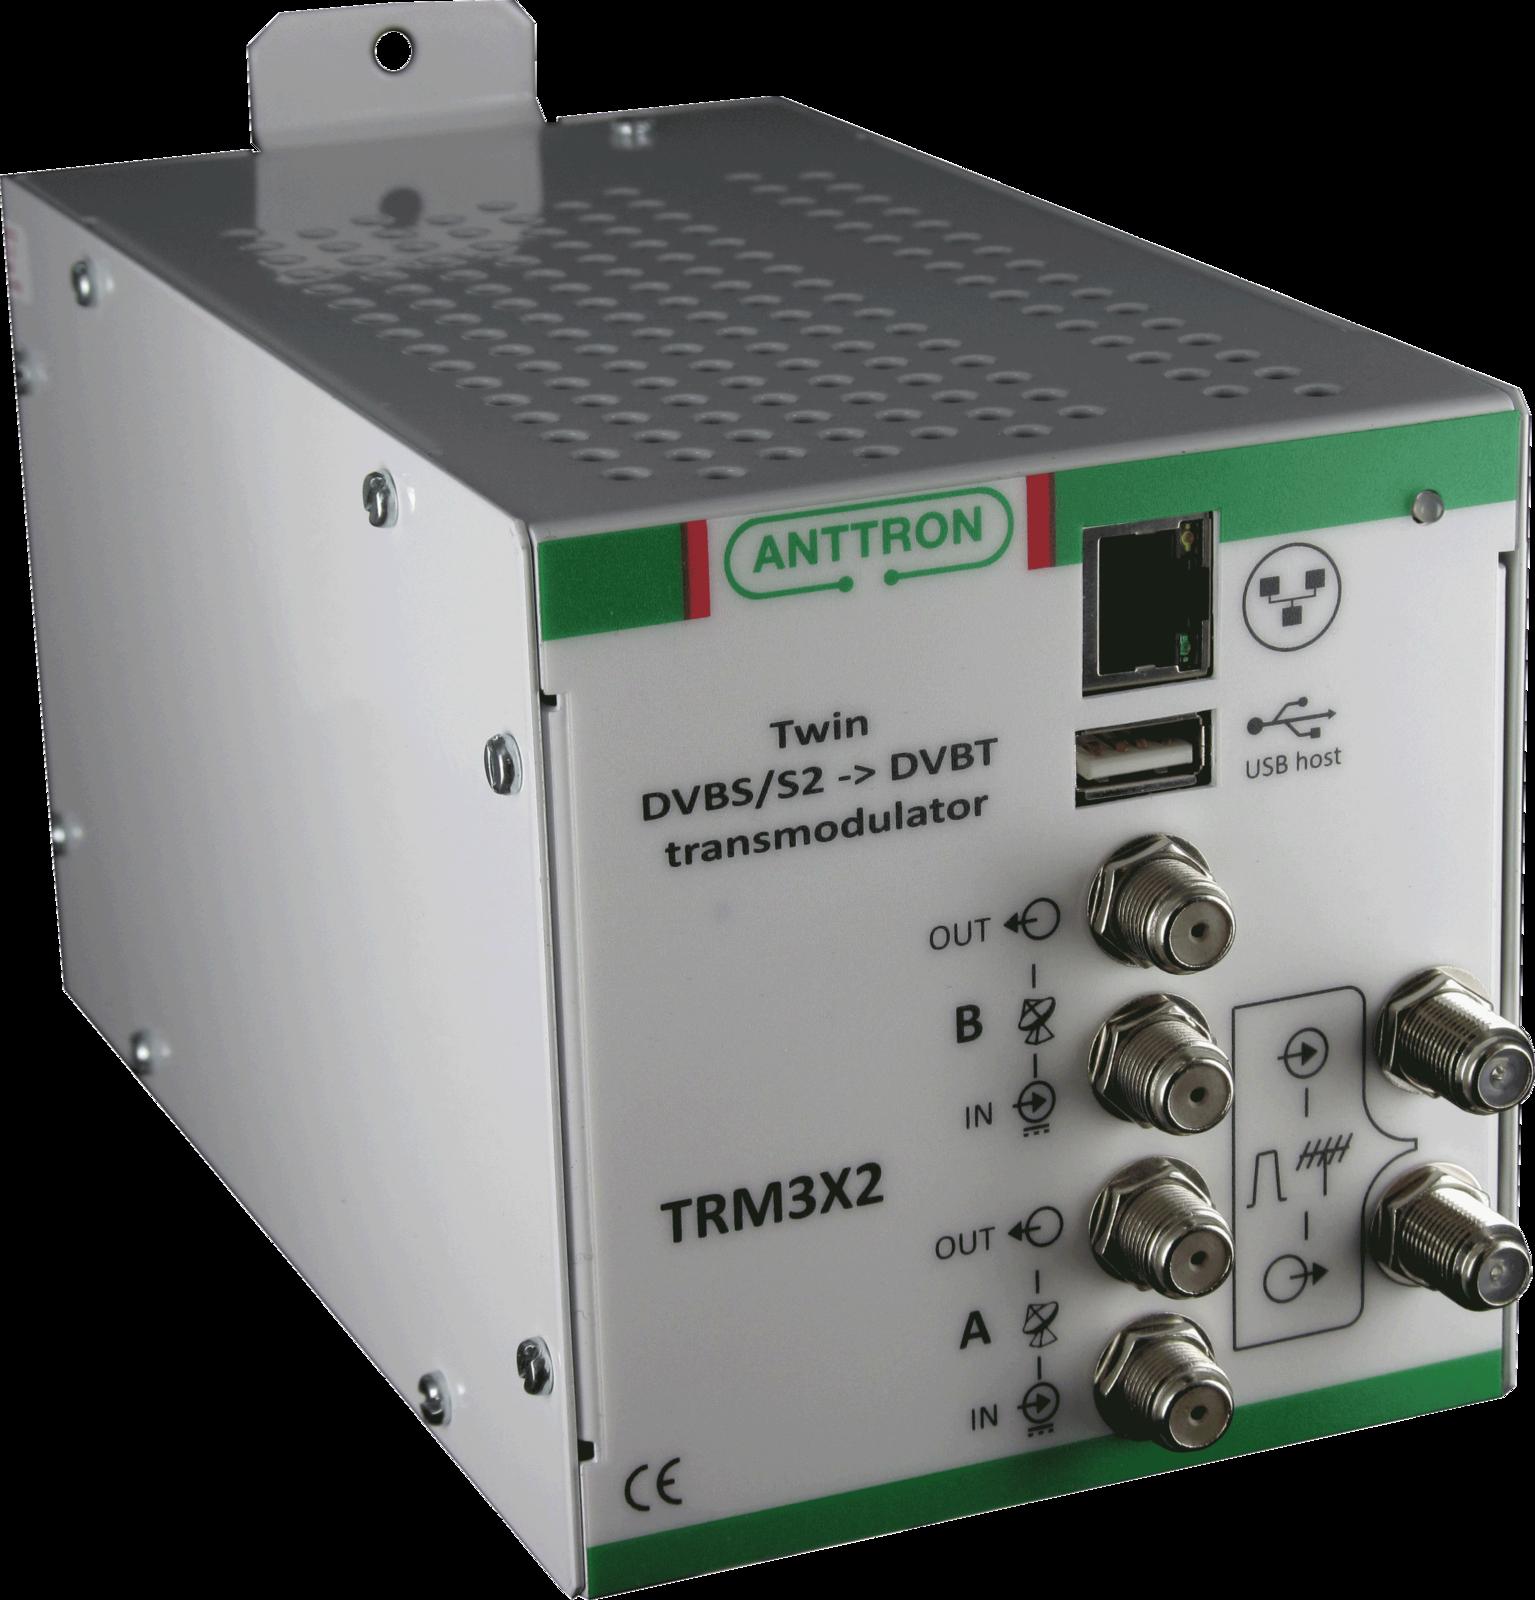 Anttron CRM3x2 Twin QPSK/DVB